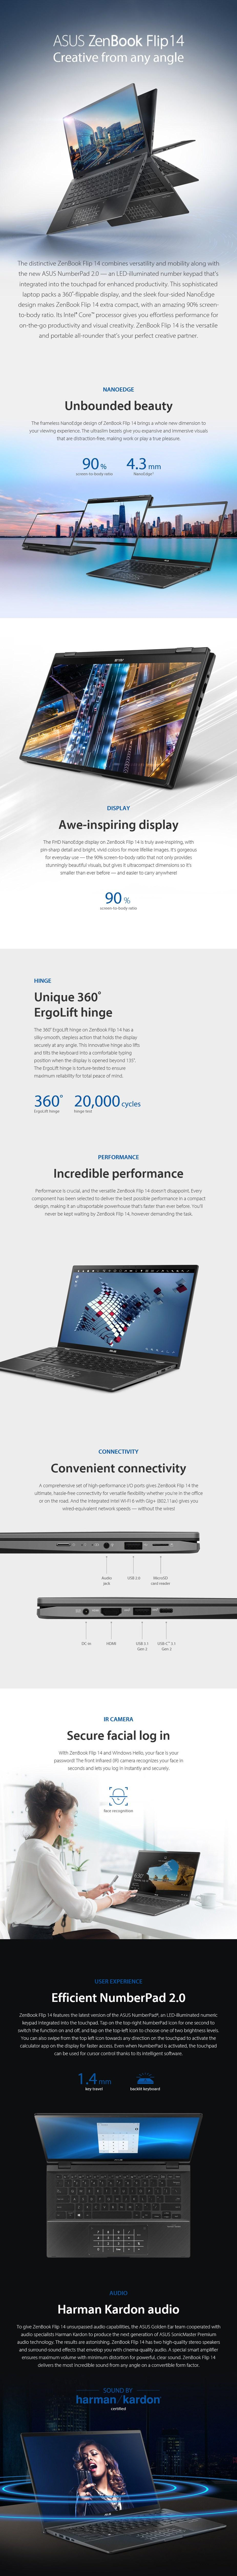 asus-zenbook-flip-14-ux463fa-14-laptop-i510210u-8gb-512gb-w10p-touch-ac32598-7-2-.jpg